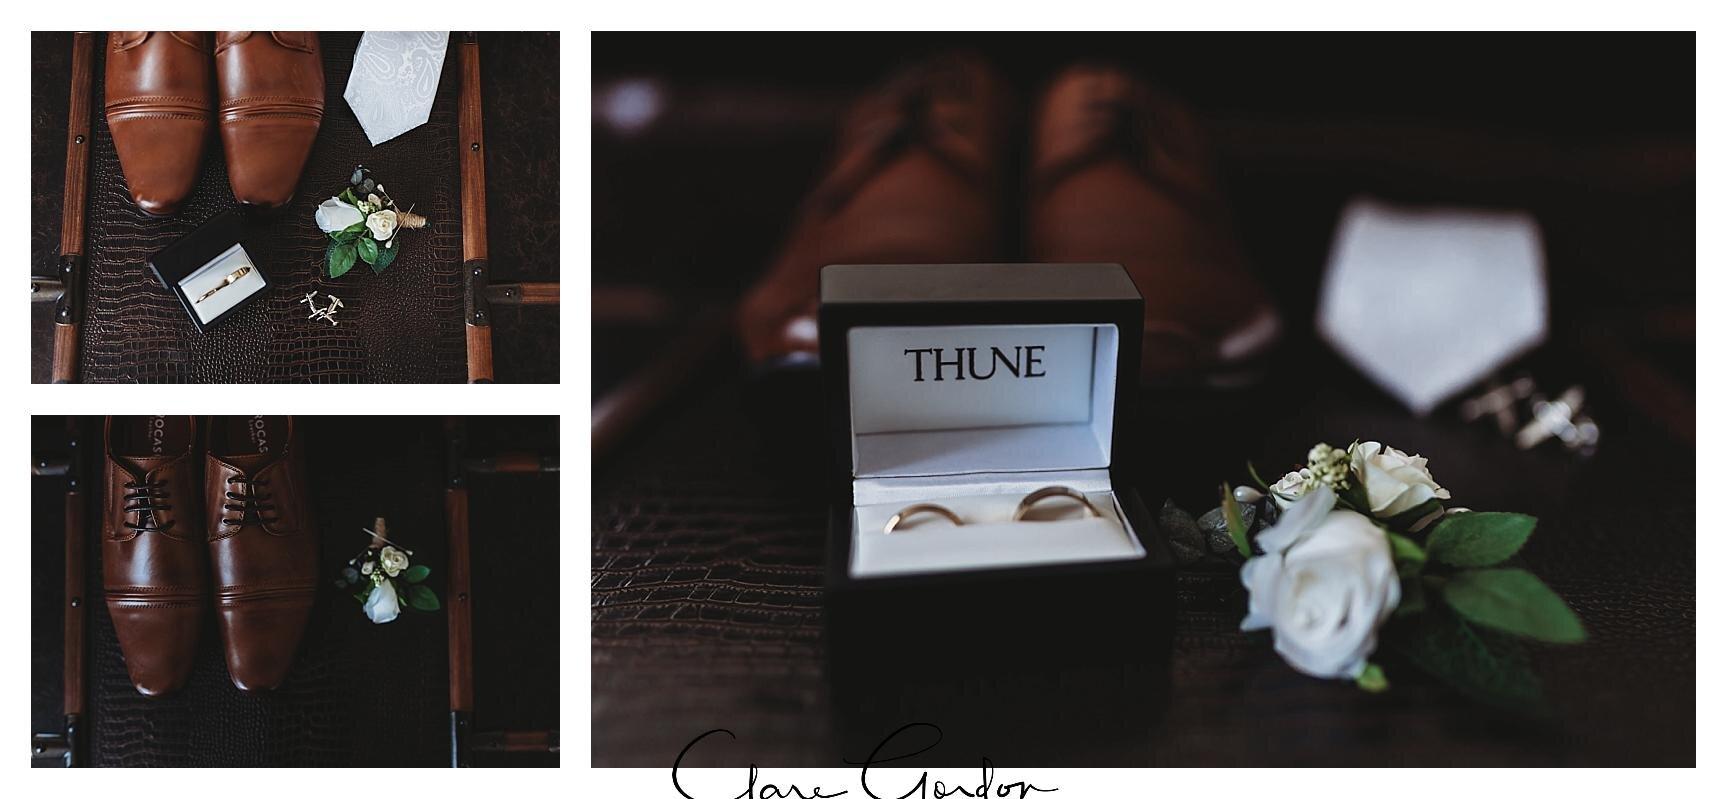 Henley-Hotel-Cherry-blossom-wedding-photos (4).jpg